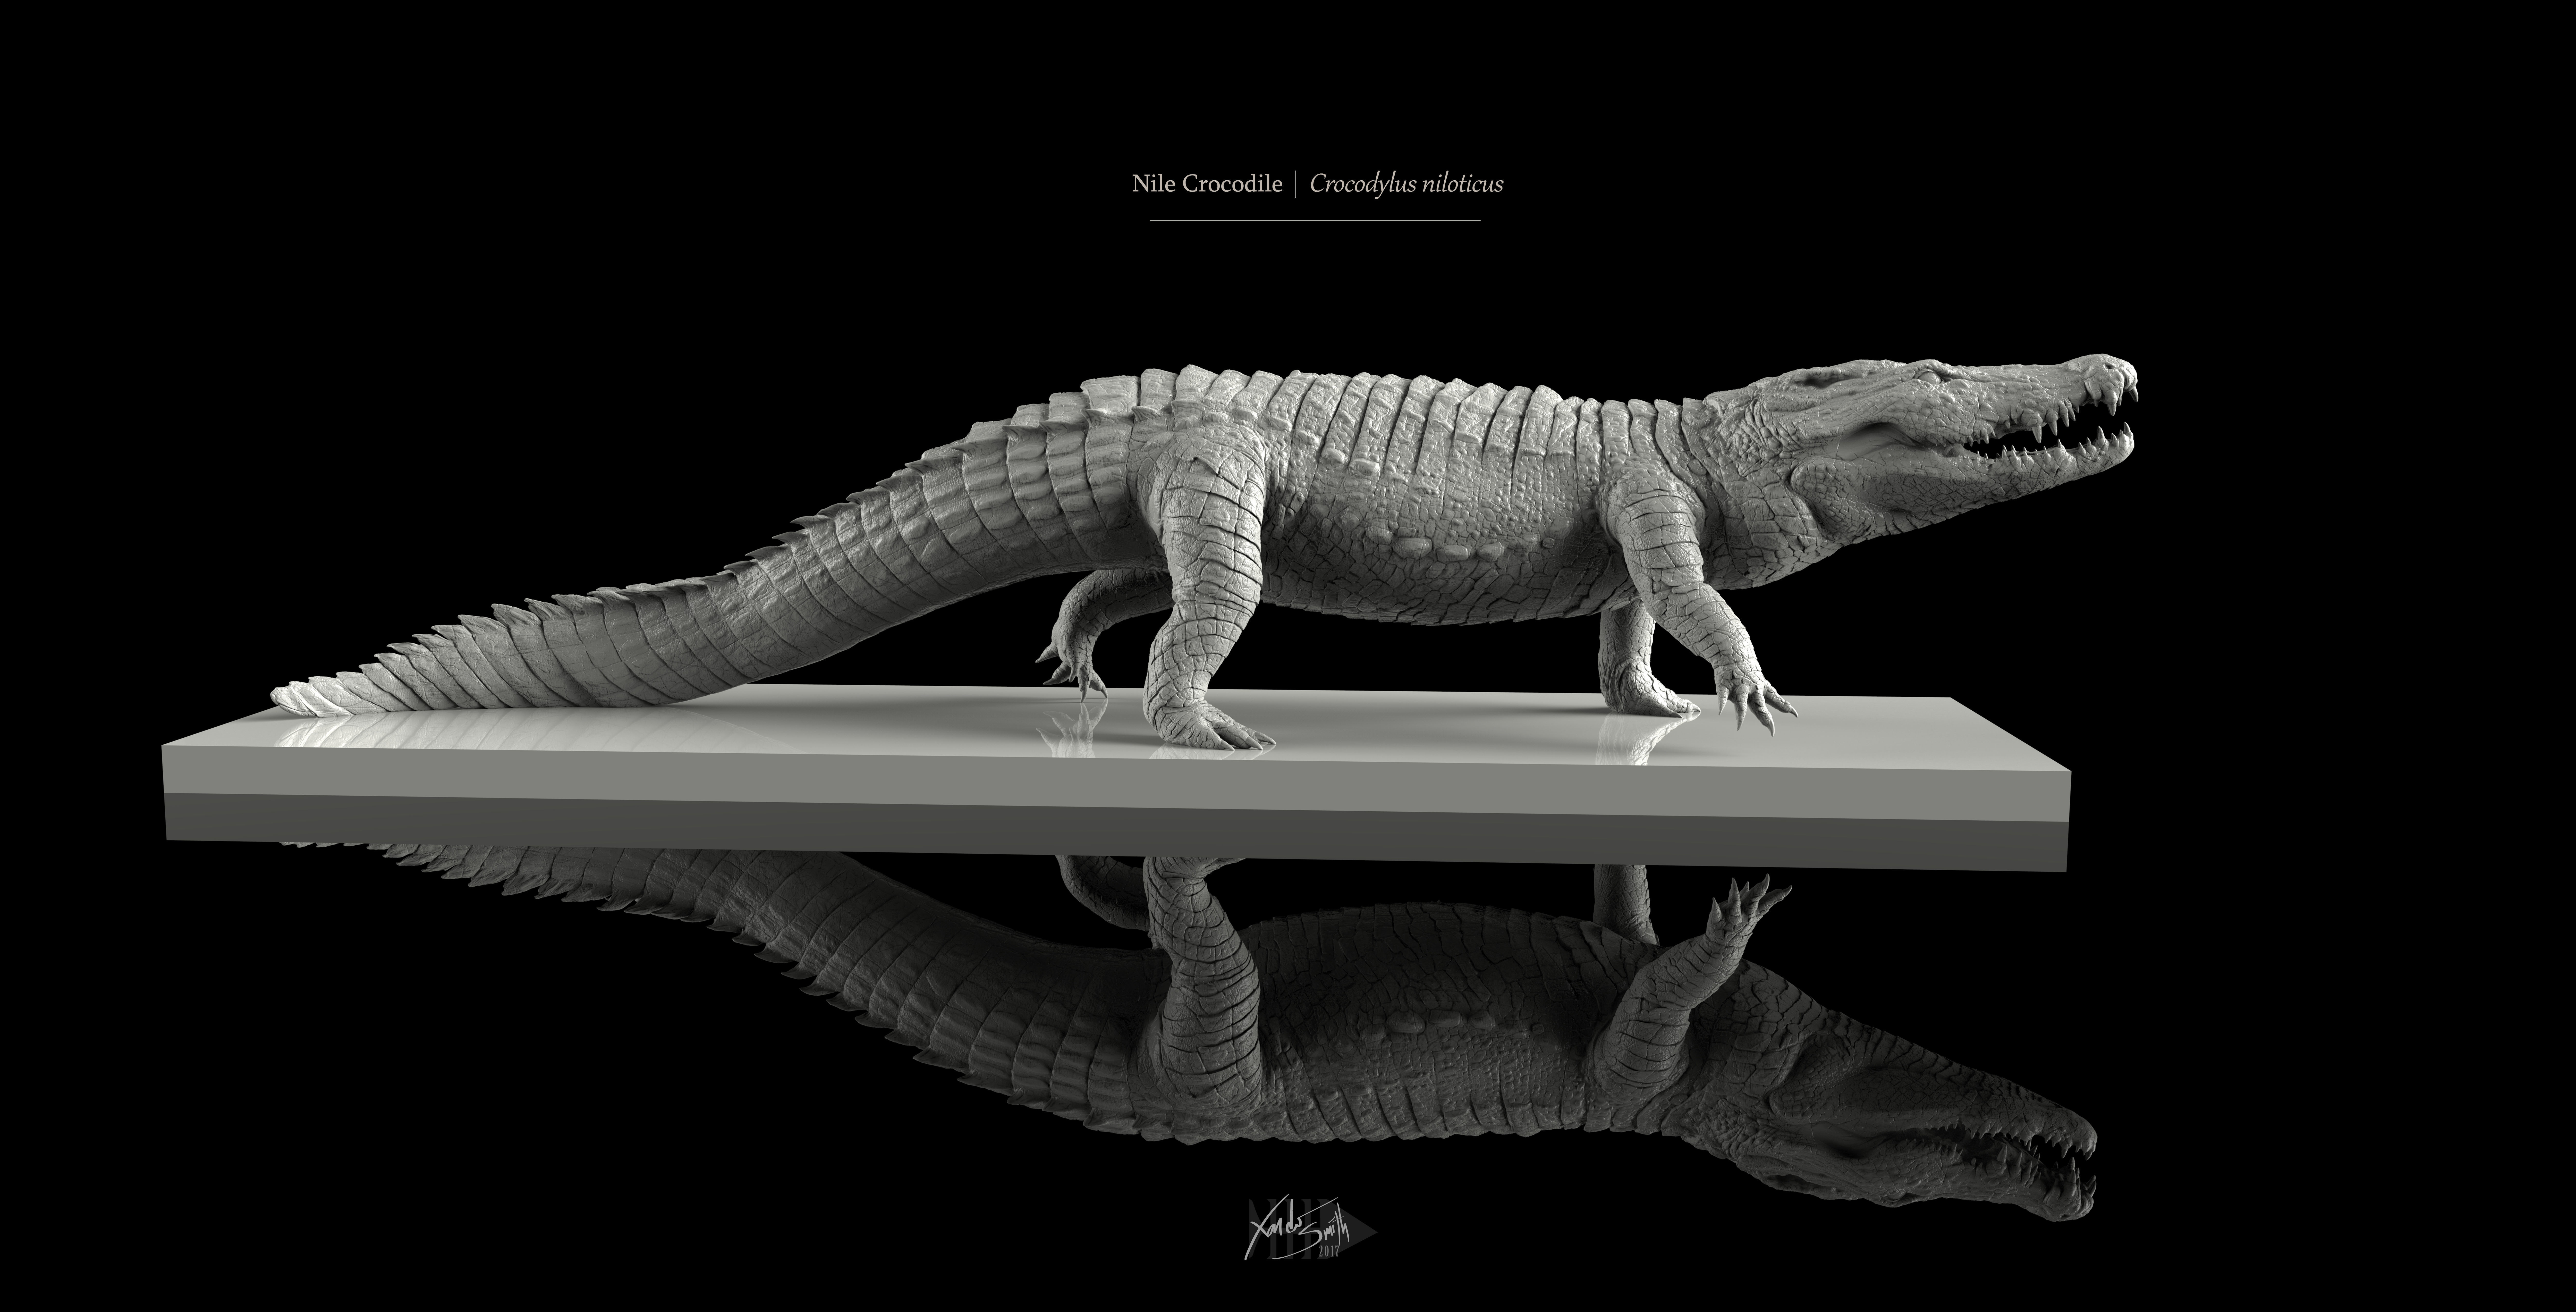 Nile Crocodile 3D Model LowPoly SubD HighPoly Decimated